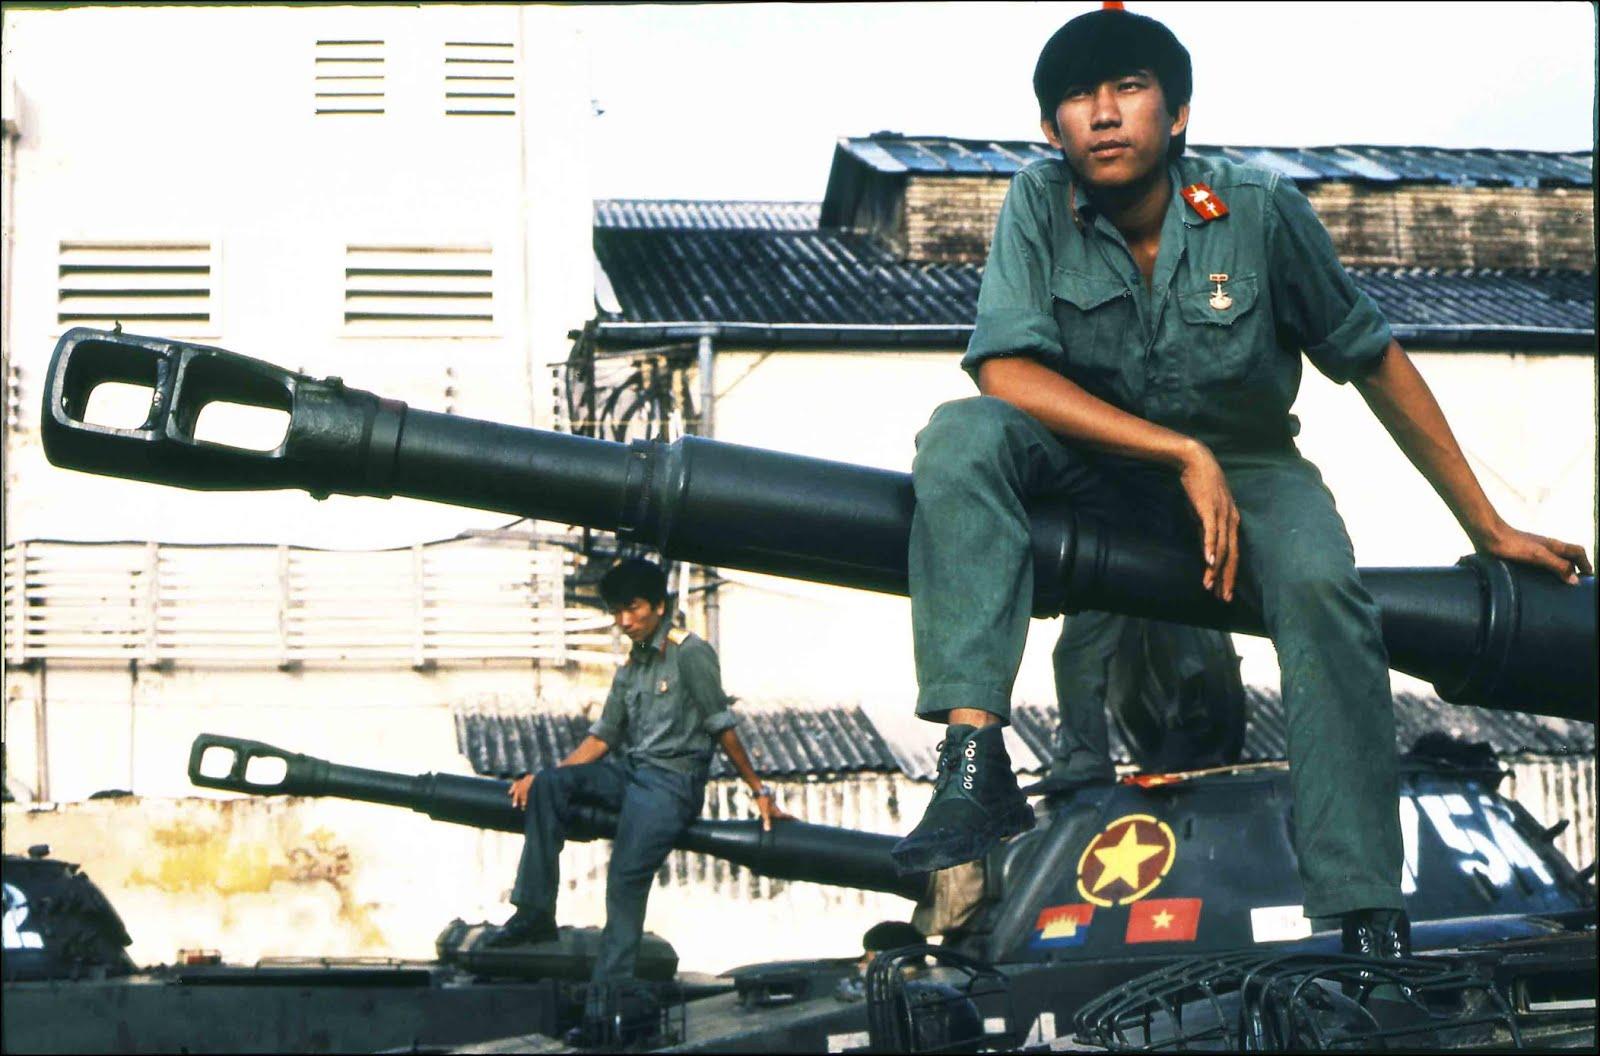 Vietnam's hidden hand in Cambodia's impasse